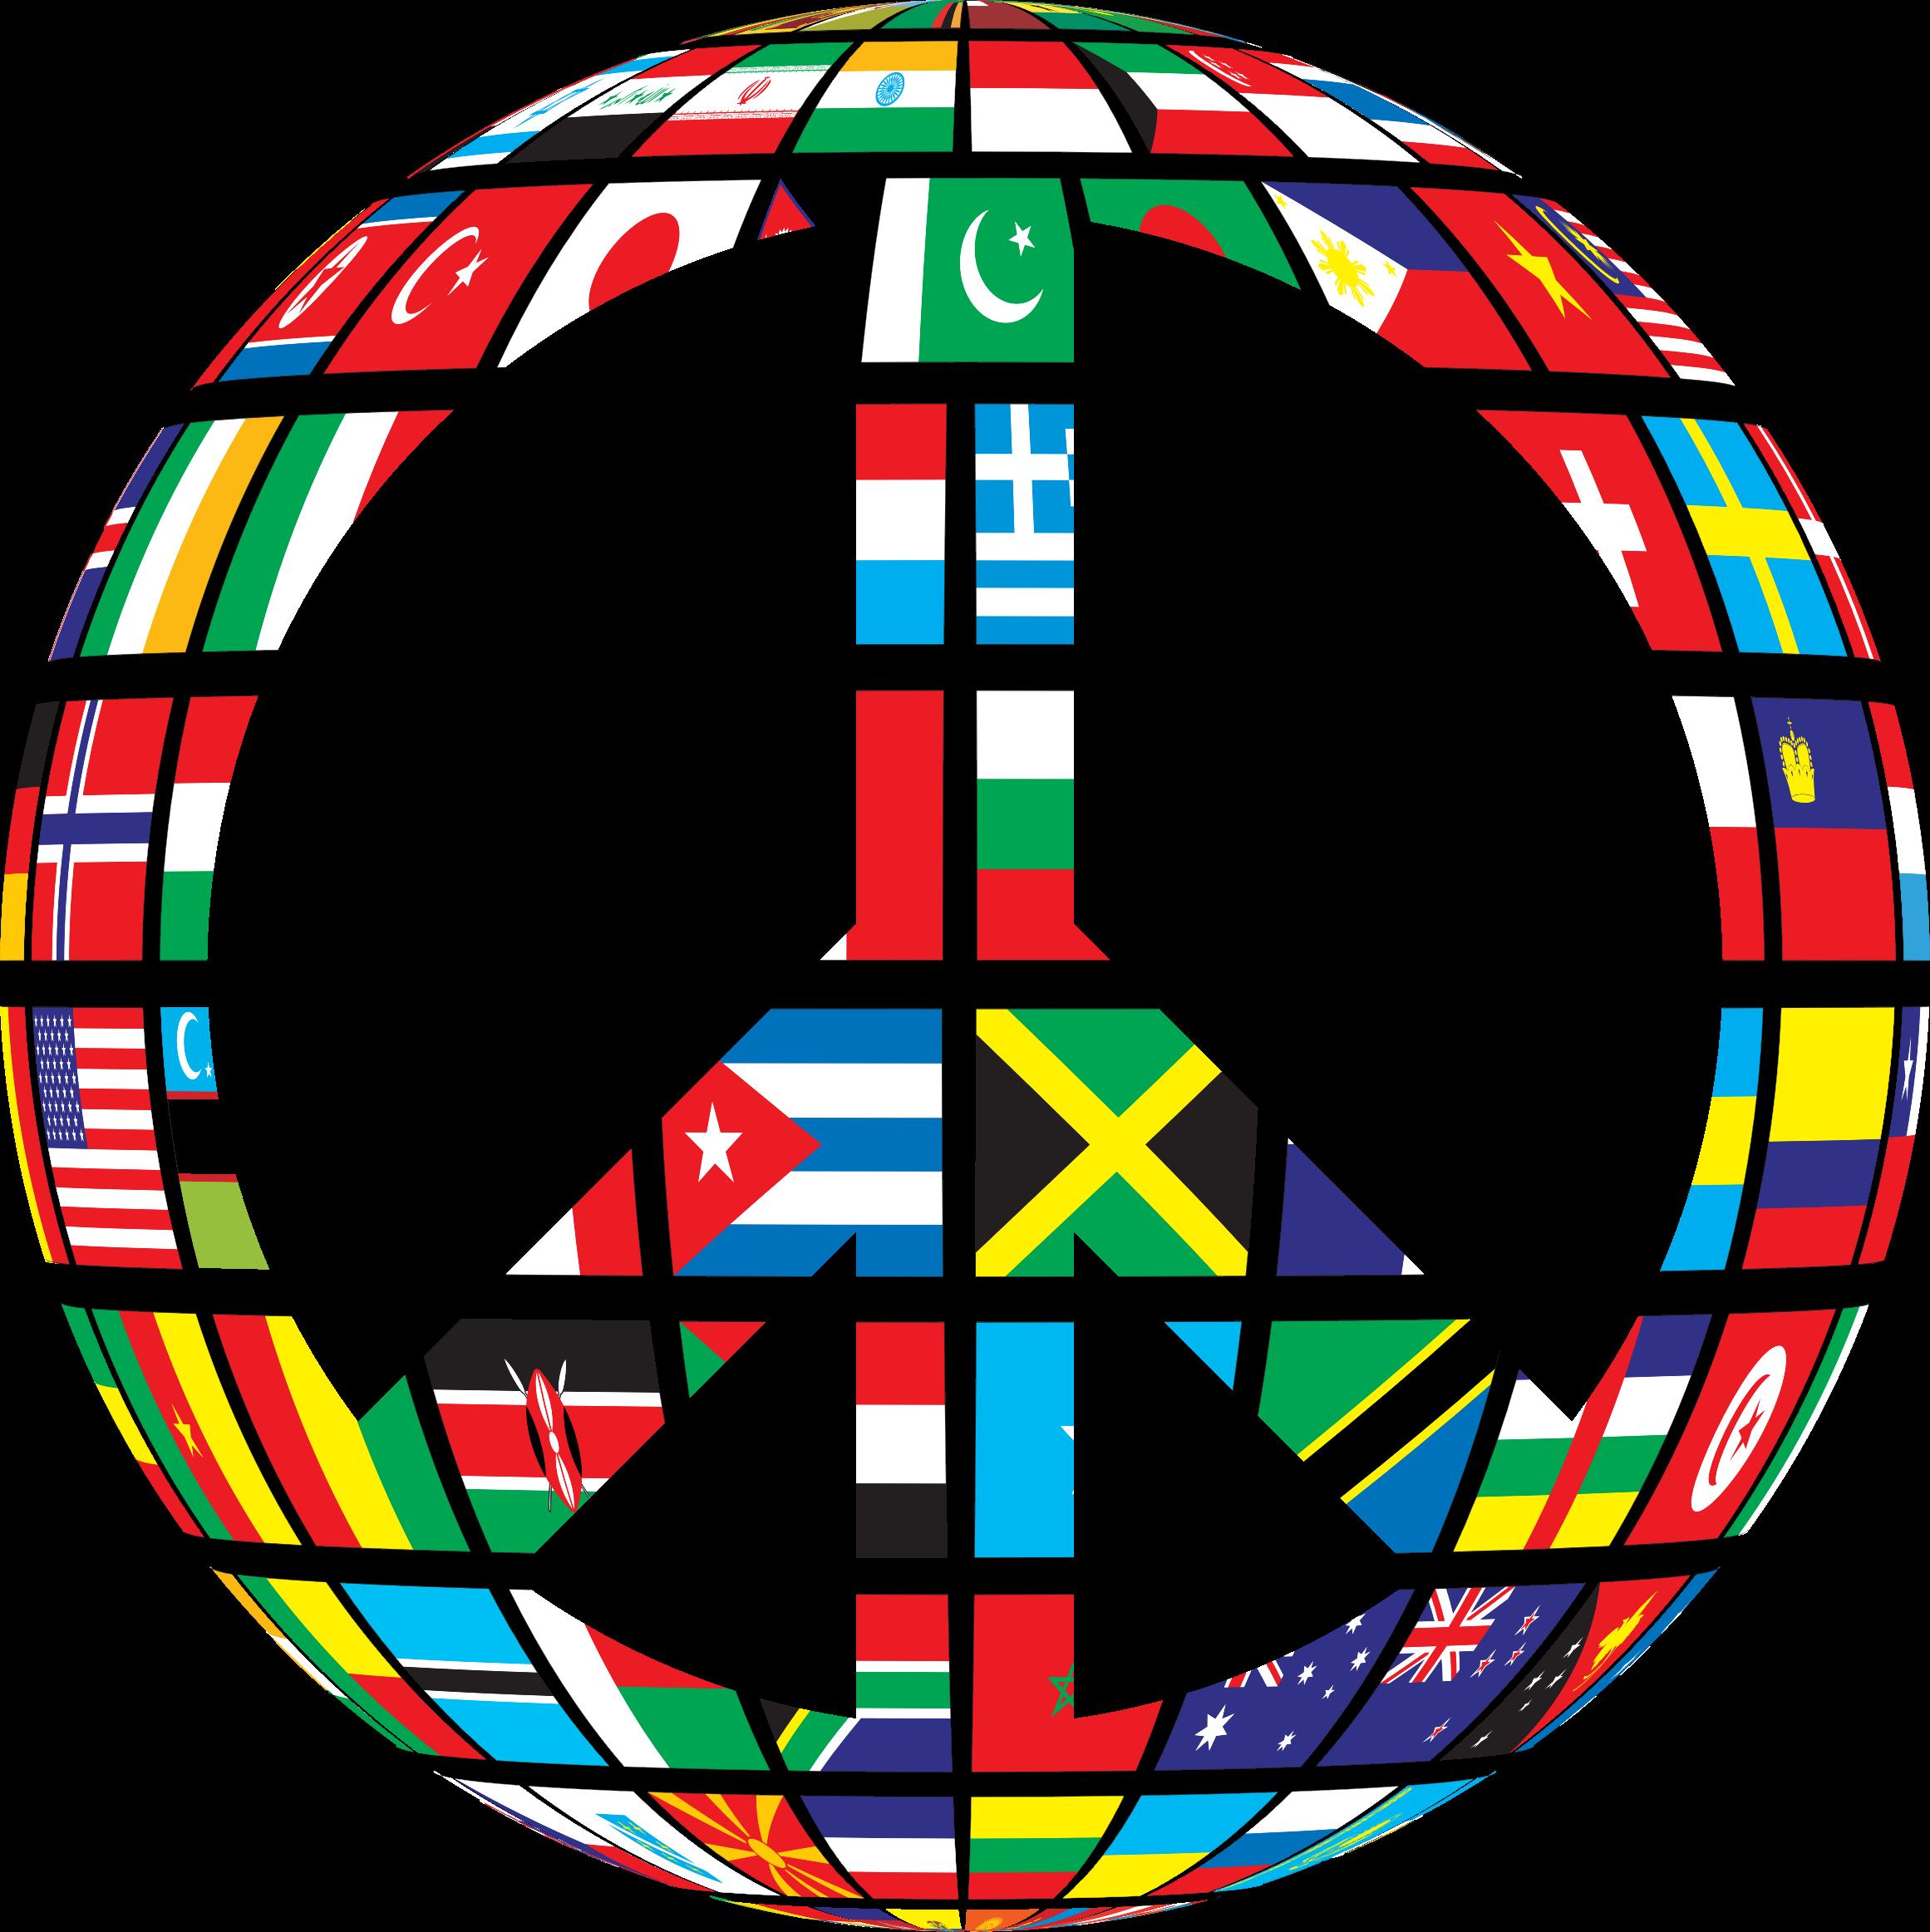 clipart global peace peace sign clip art images peace sign clip art free